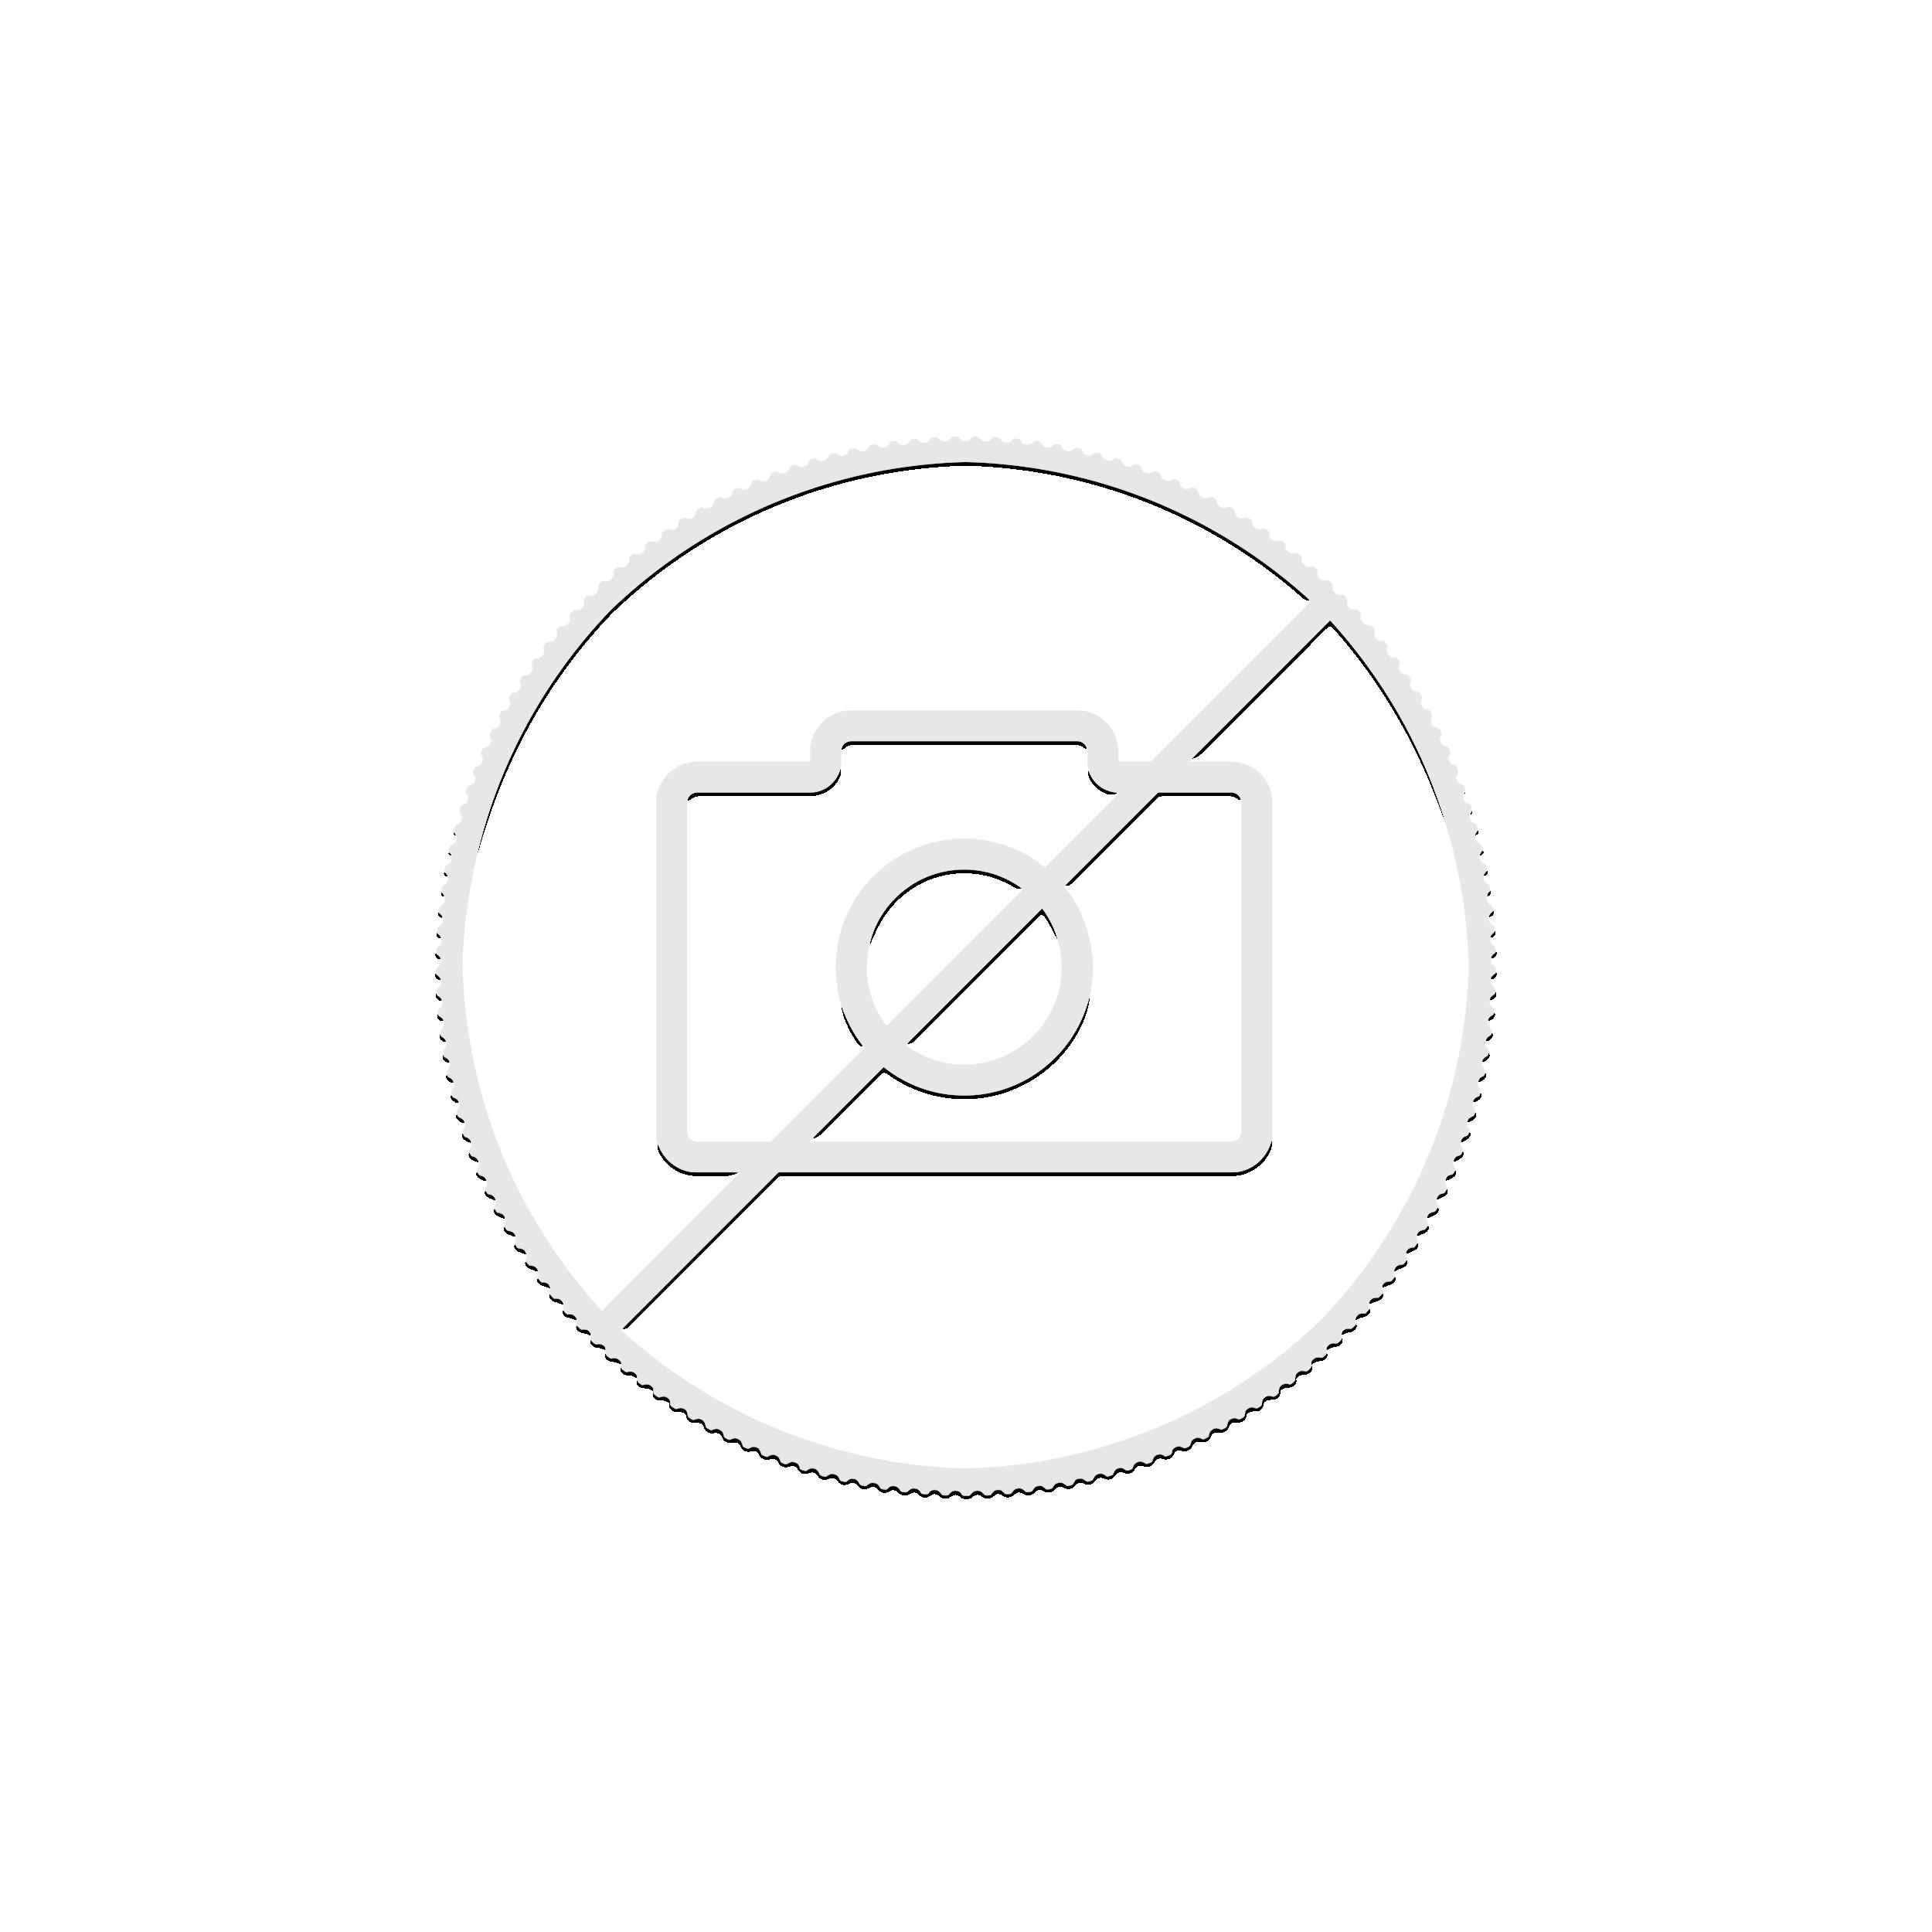 1 troy ounce gold Krugerrand coin